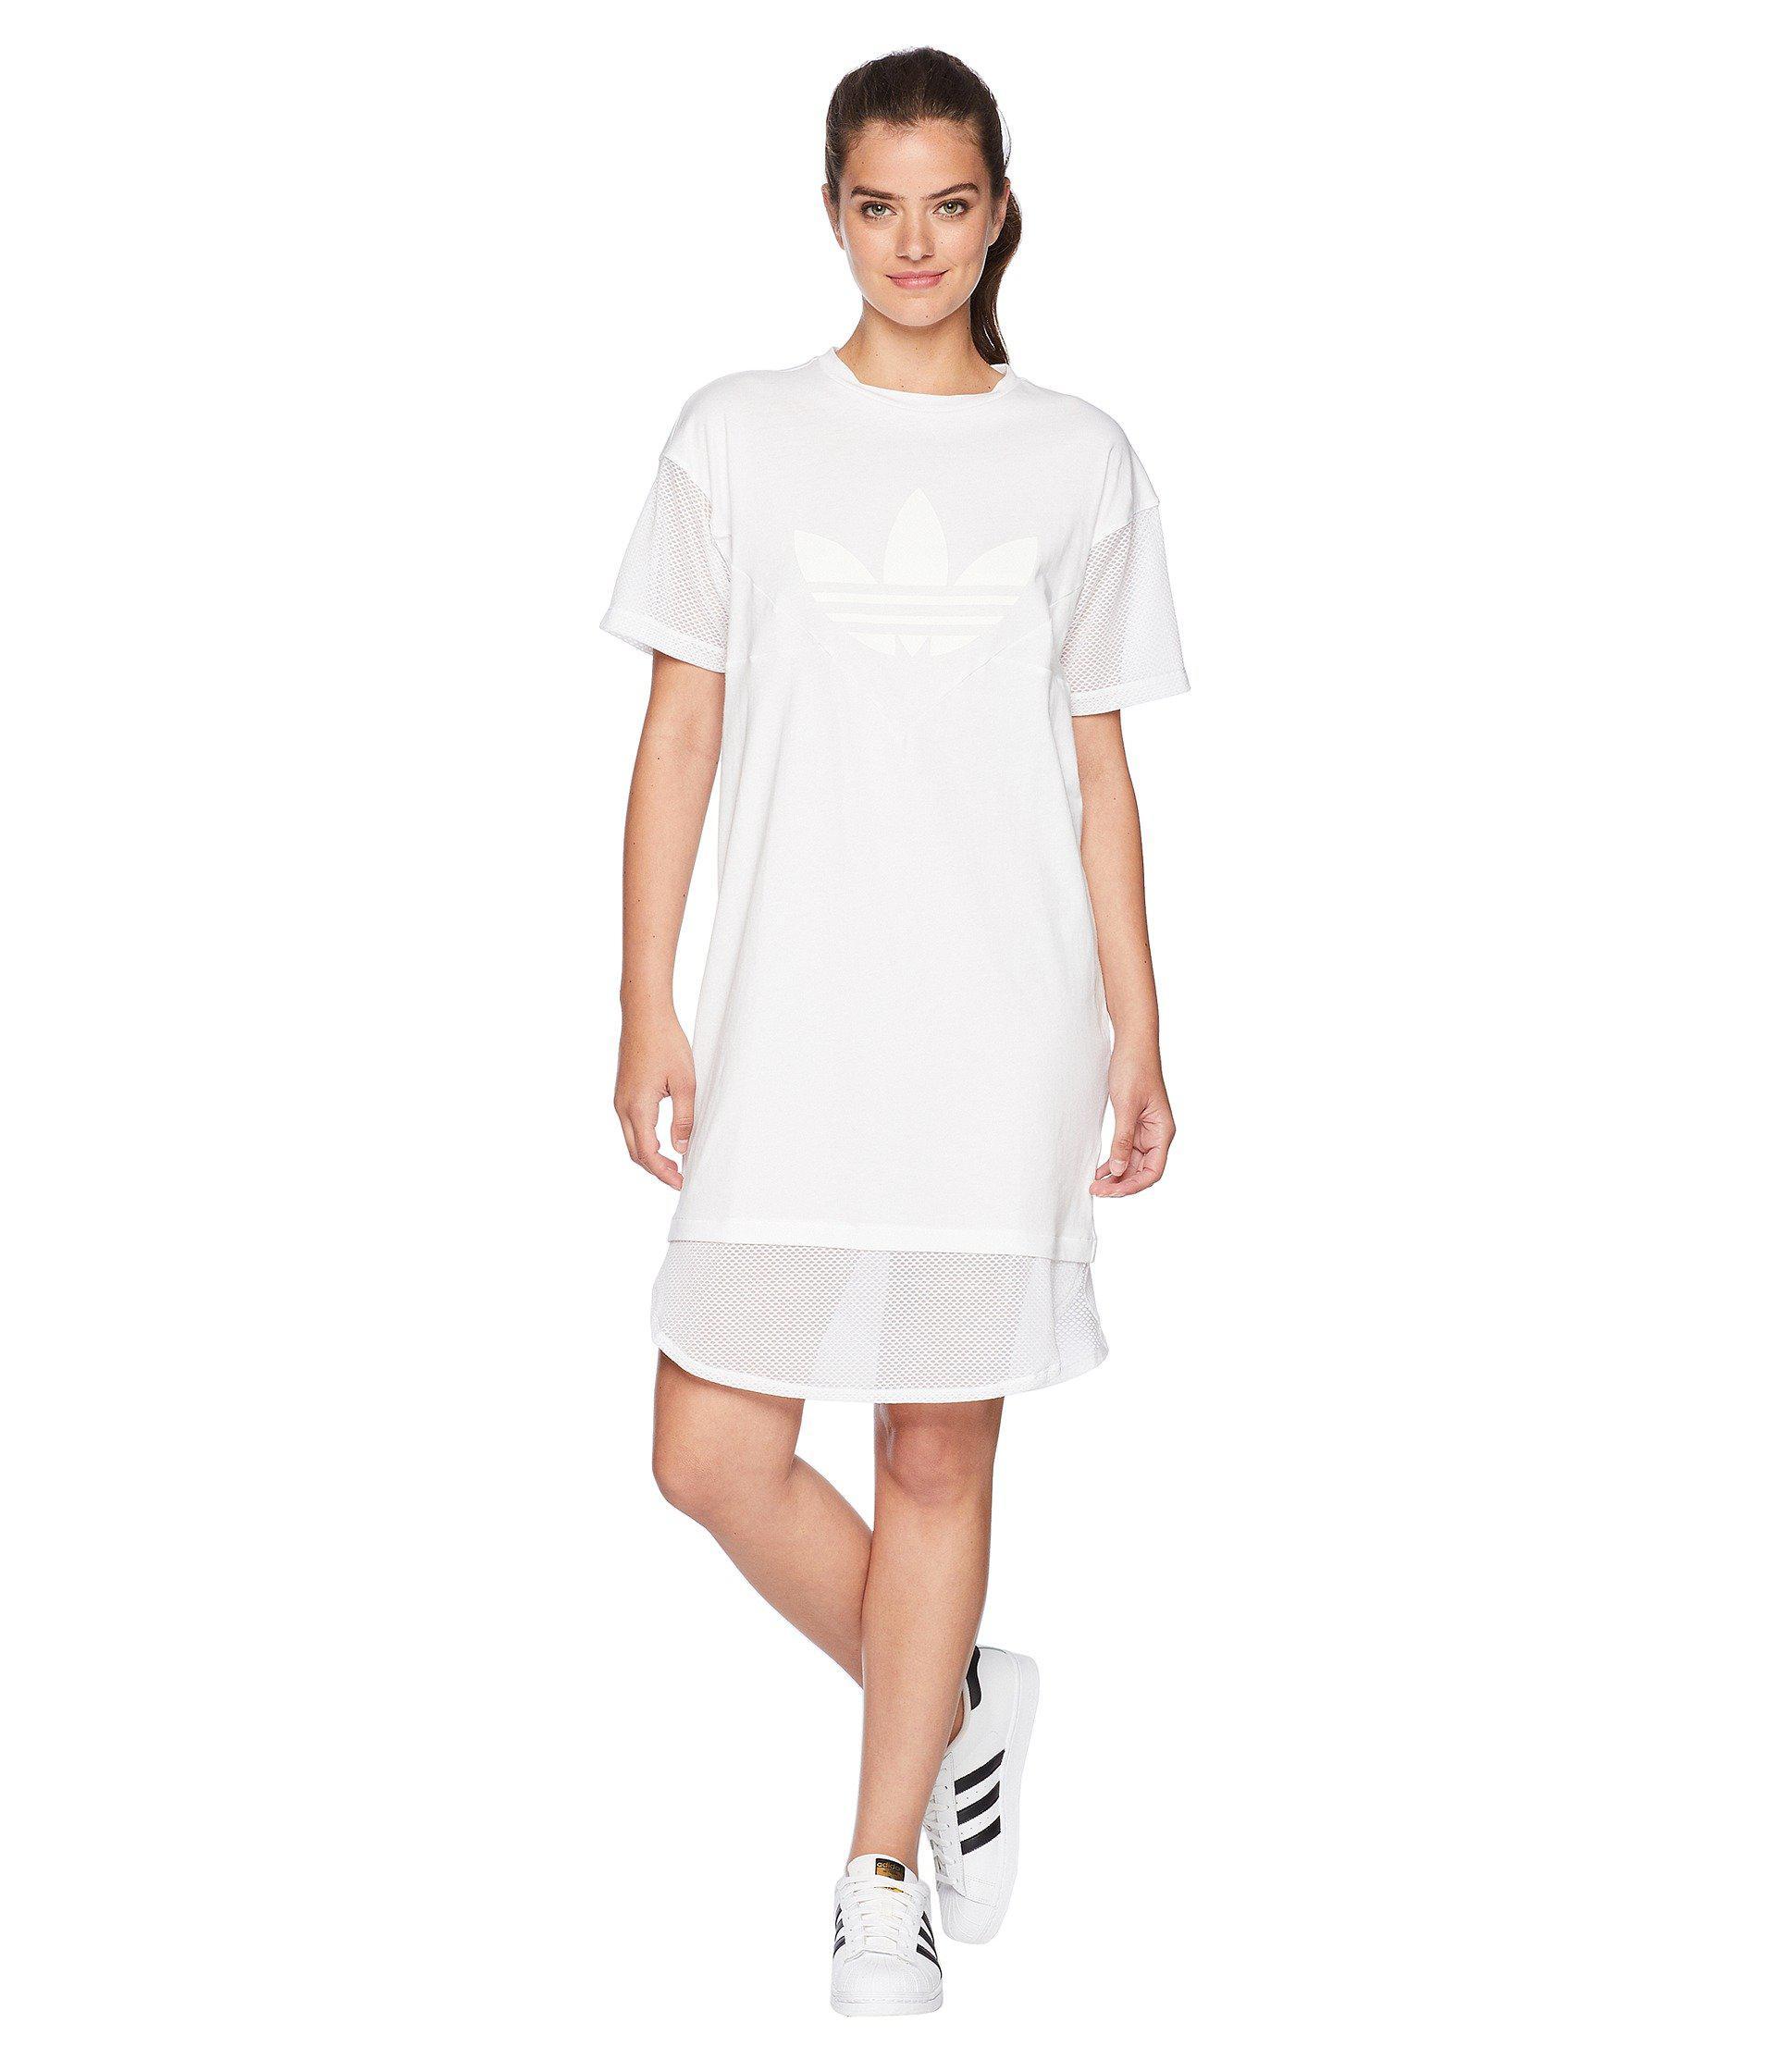 0427e628187 Lyst - adidas Originals Clrdo Tee Dress in White